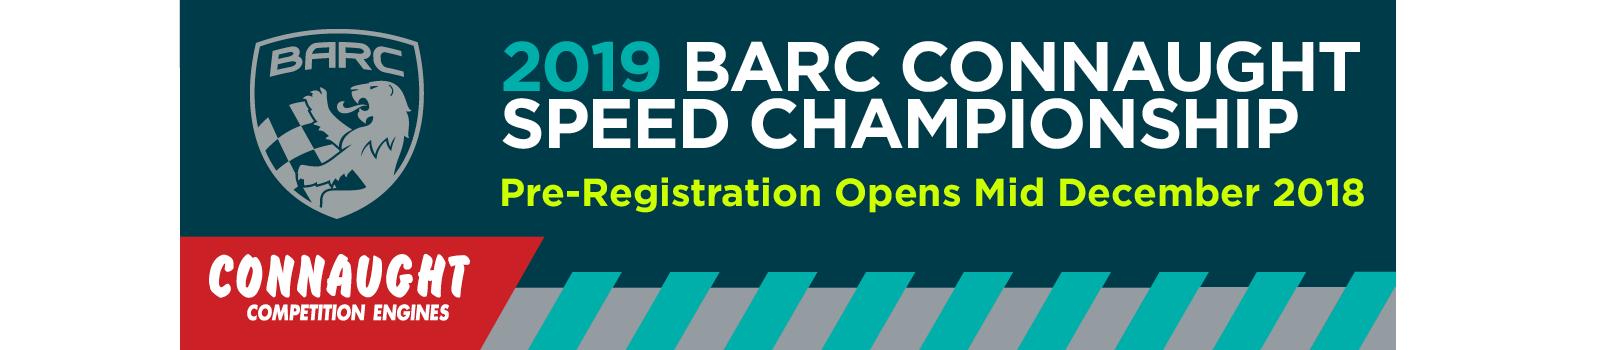 2019 Championship Pre-Registration Banner